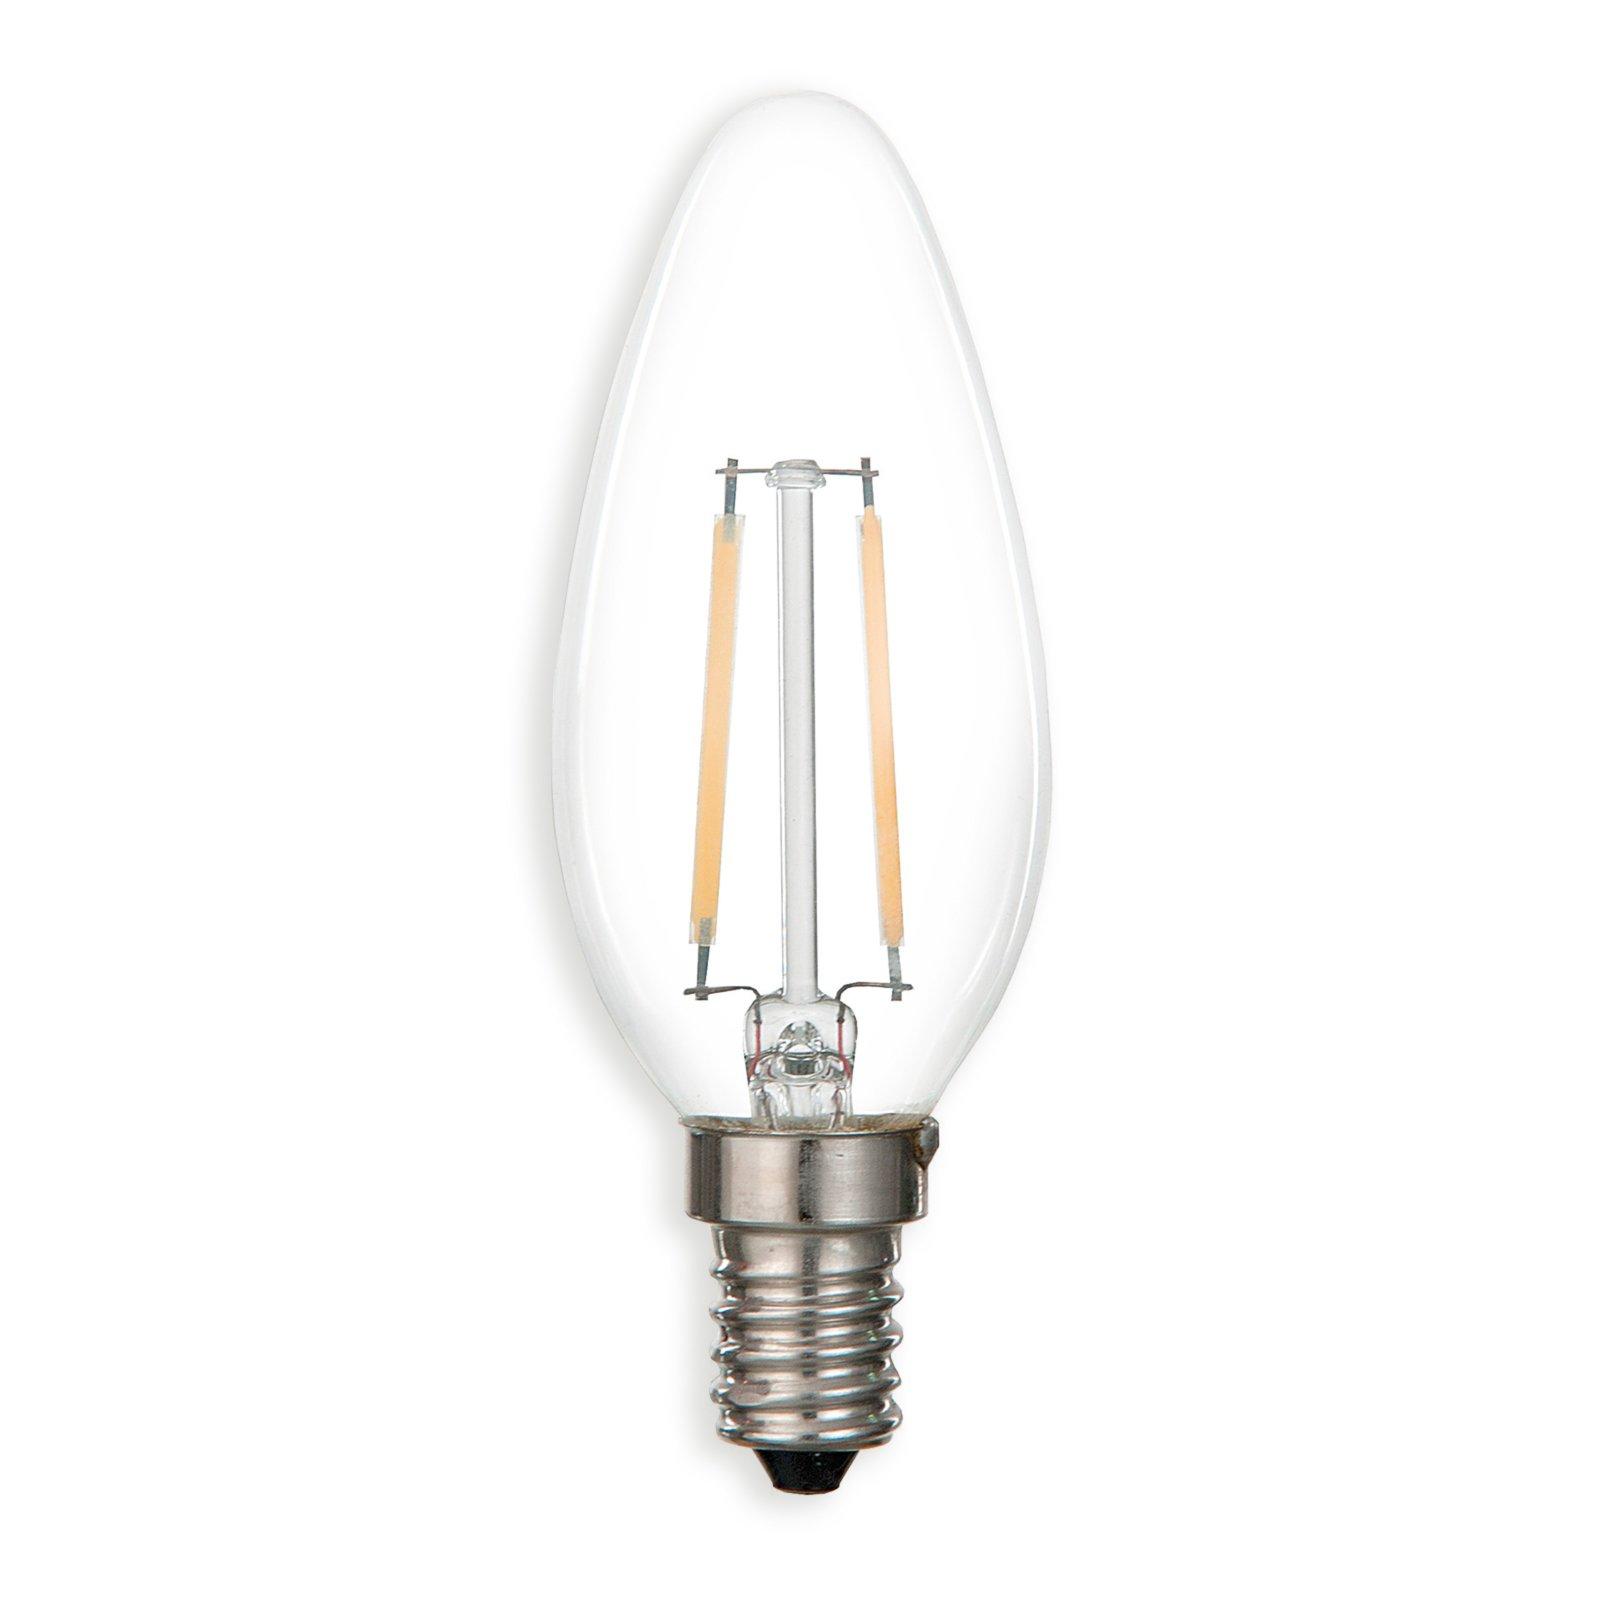 led kerzenlampe filament e14 2 watt warmwei led. Black Bedroom Furniture Sets. Home Design Ideas